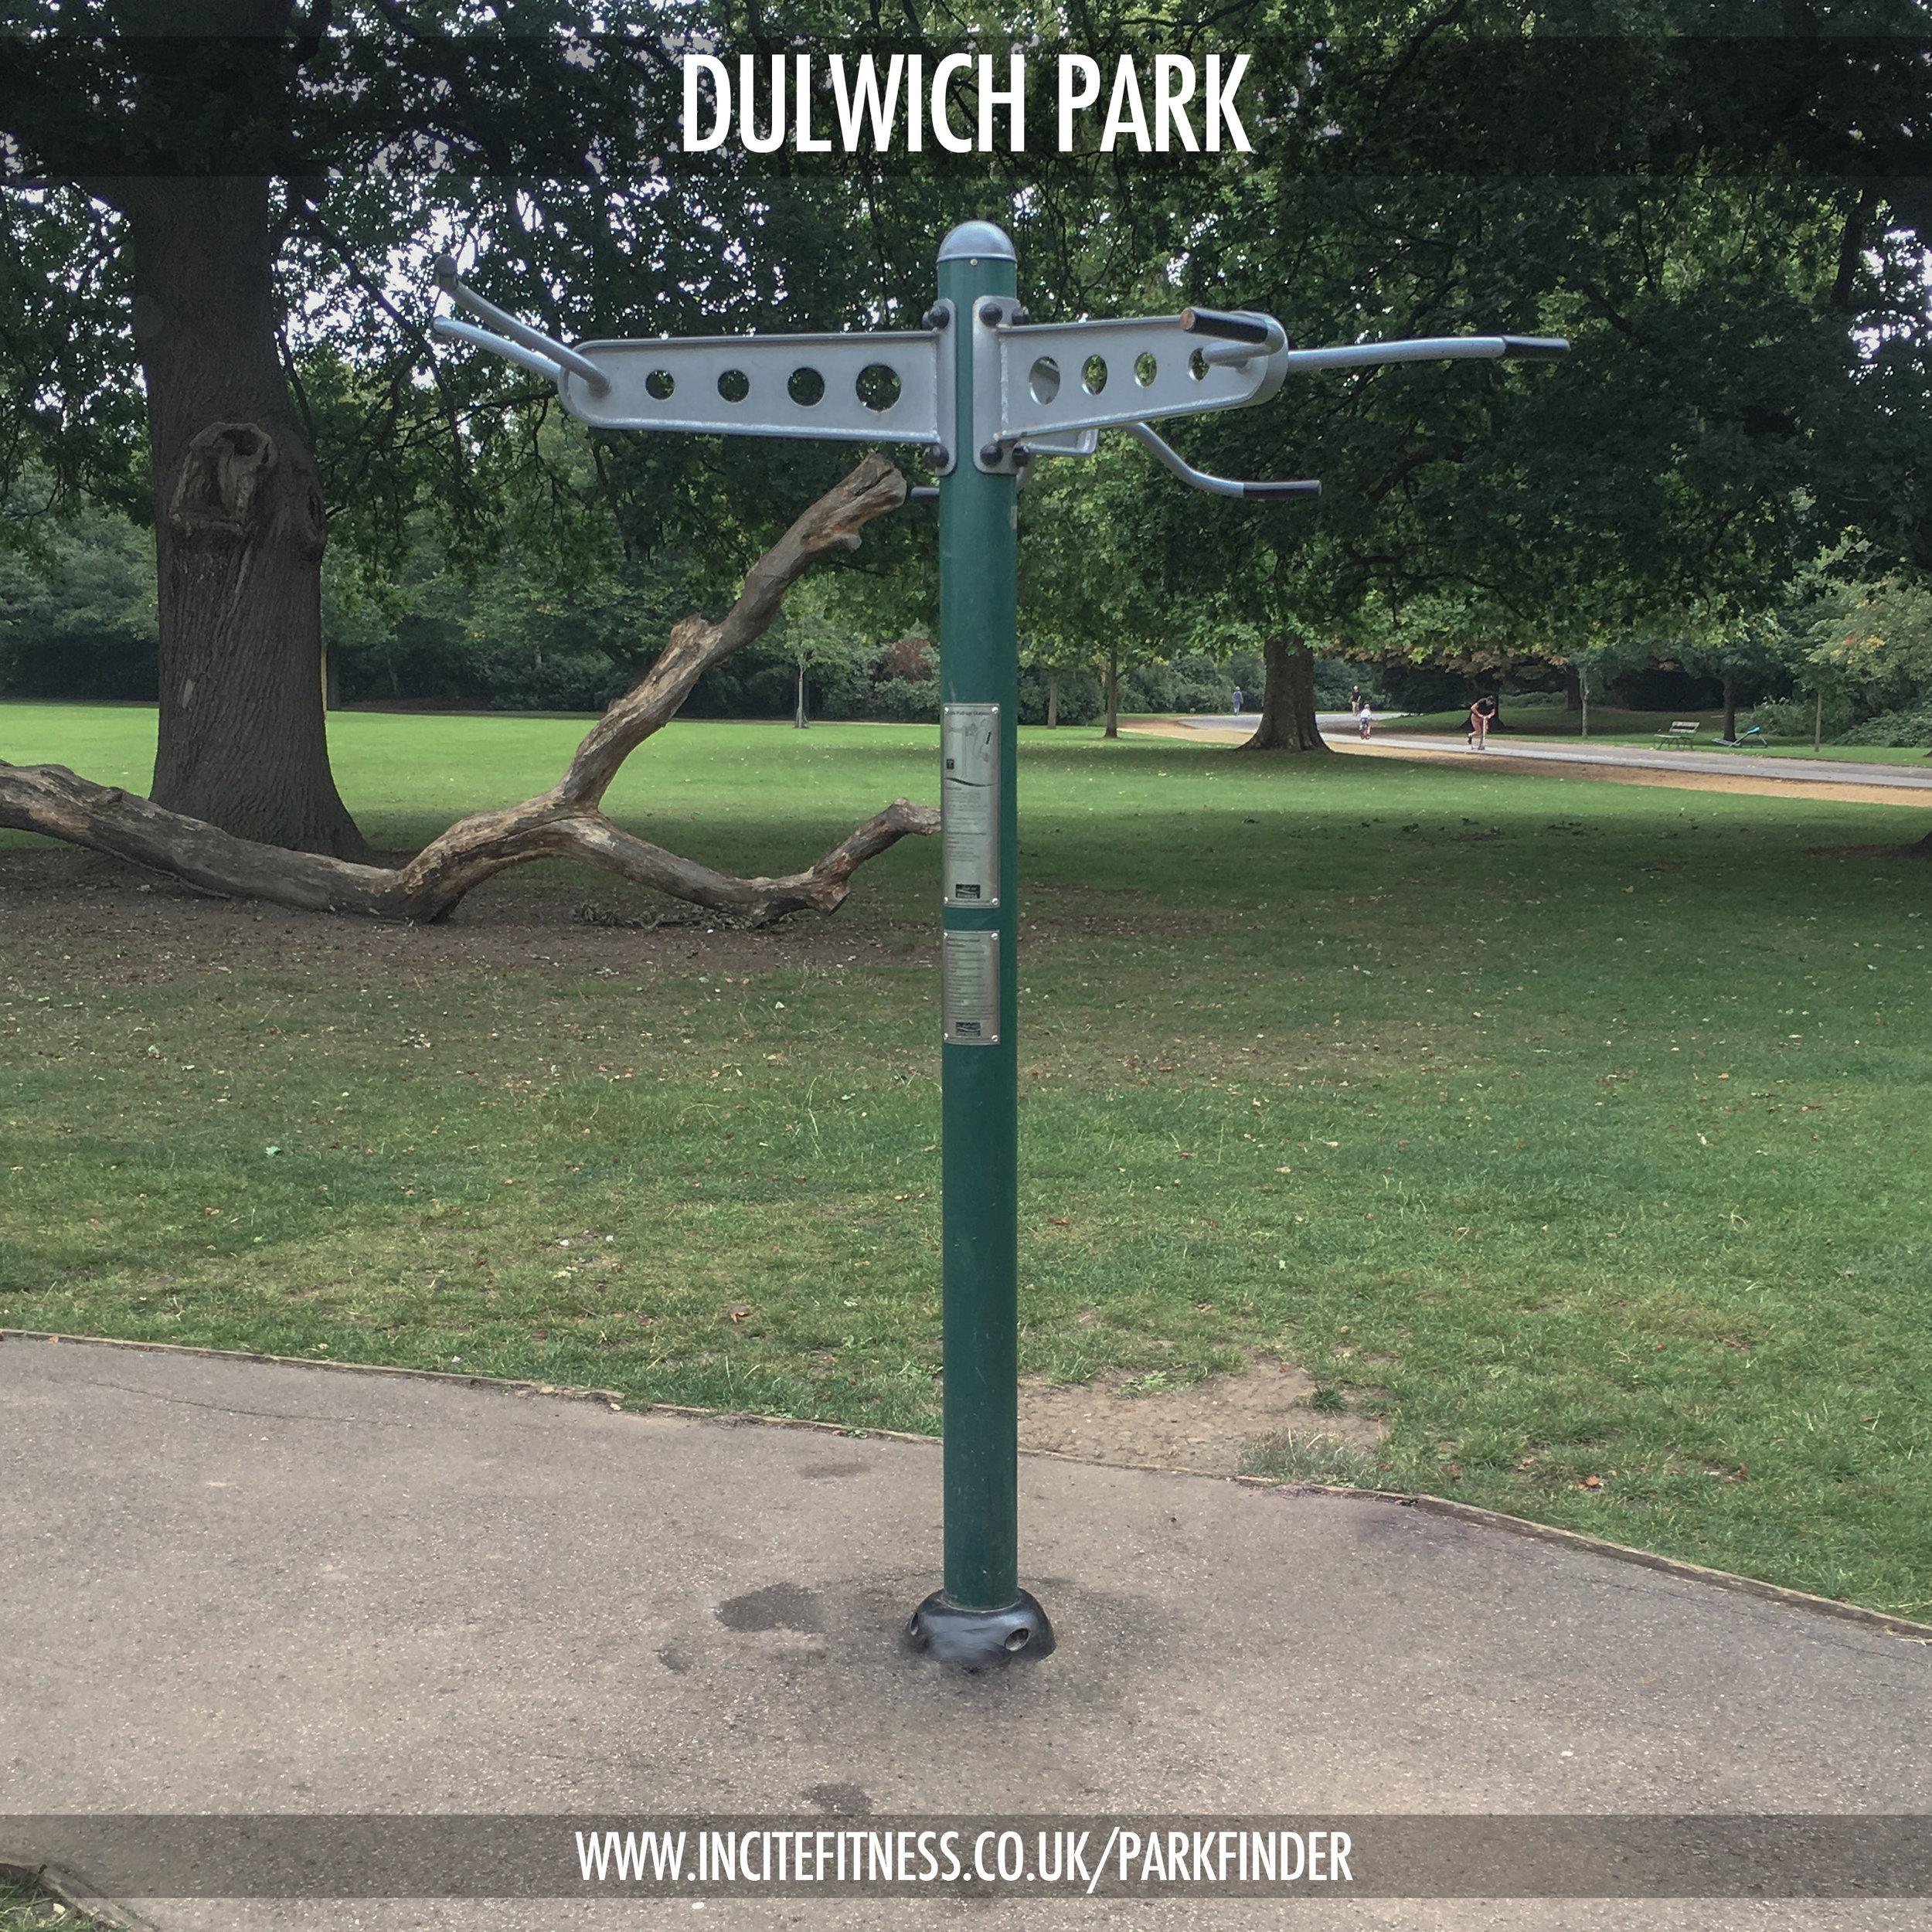 Dulwich park 01 pull up bars.jpg